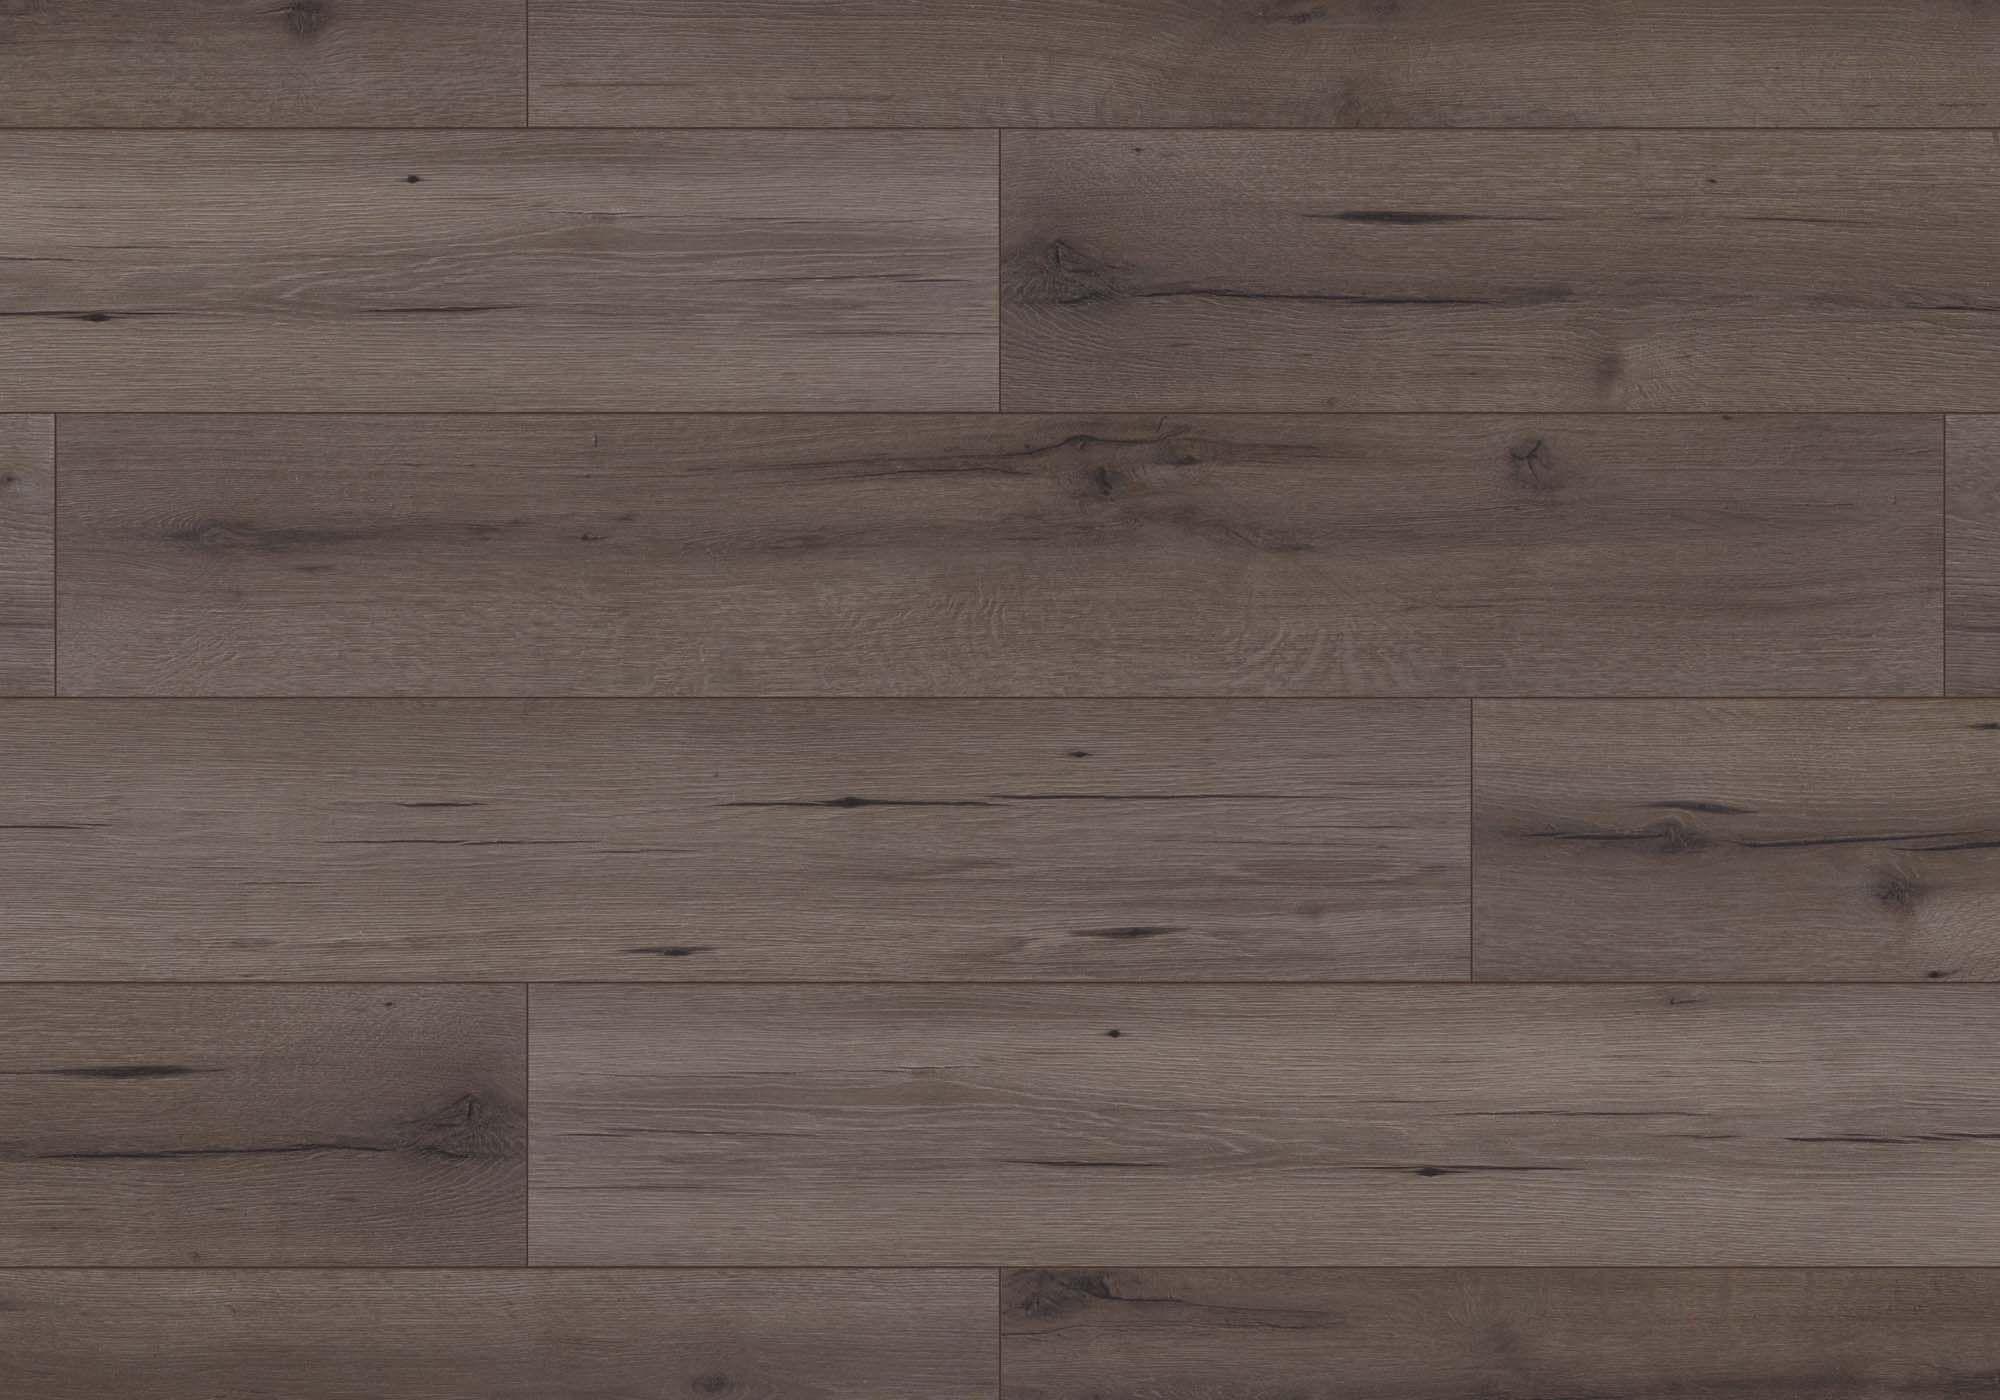 Farmdale Classic Estate Inhaus Weathered Wood Classic Hardwood Floors